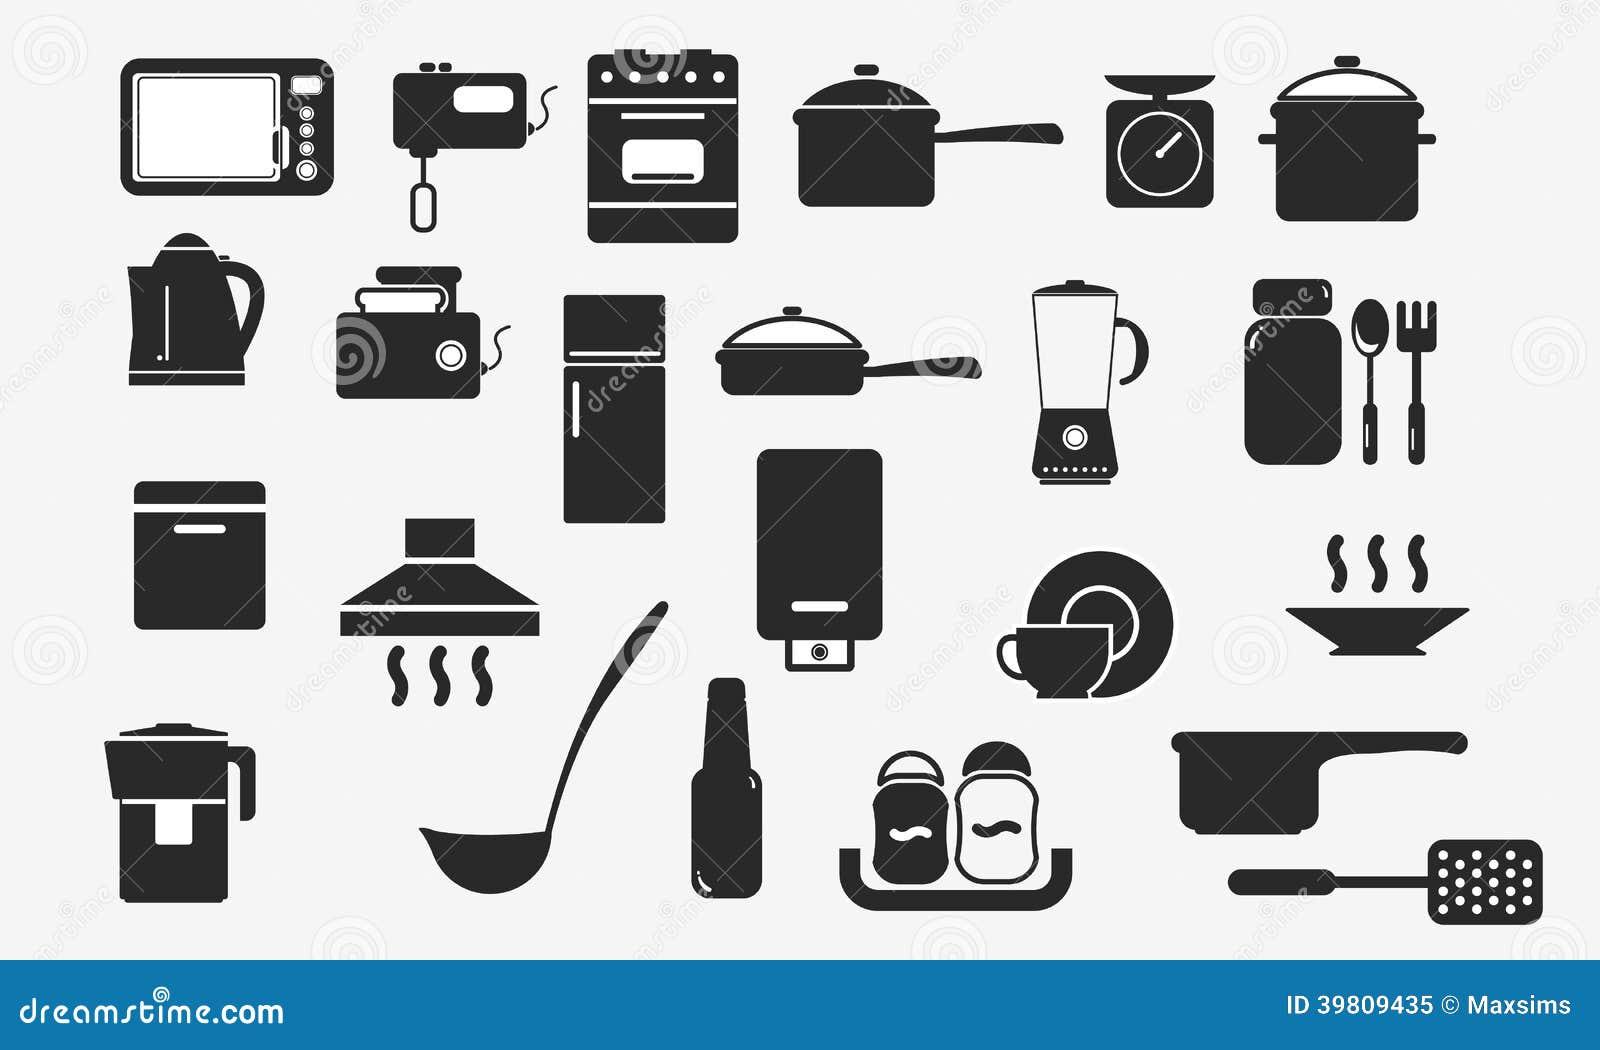 Aparatos tecnologicos - Todo lo que debes saber